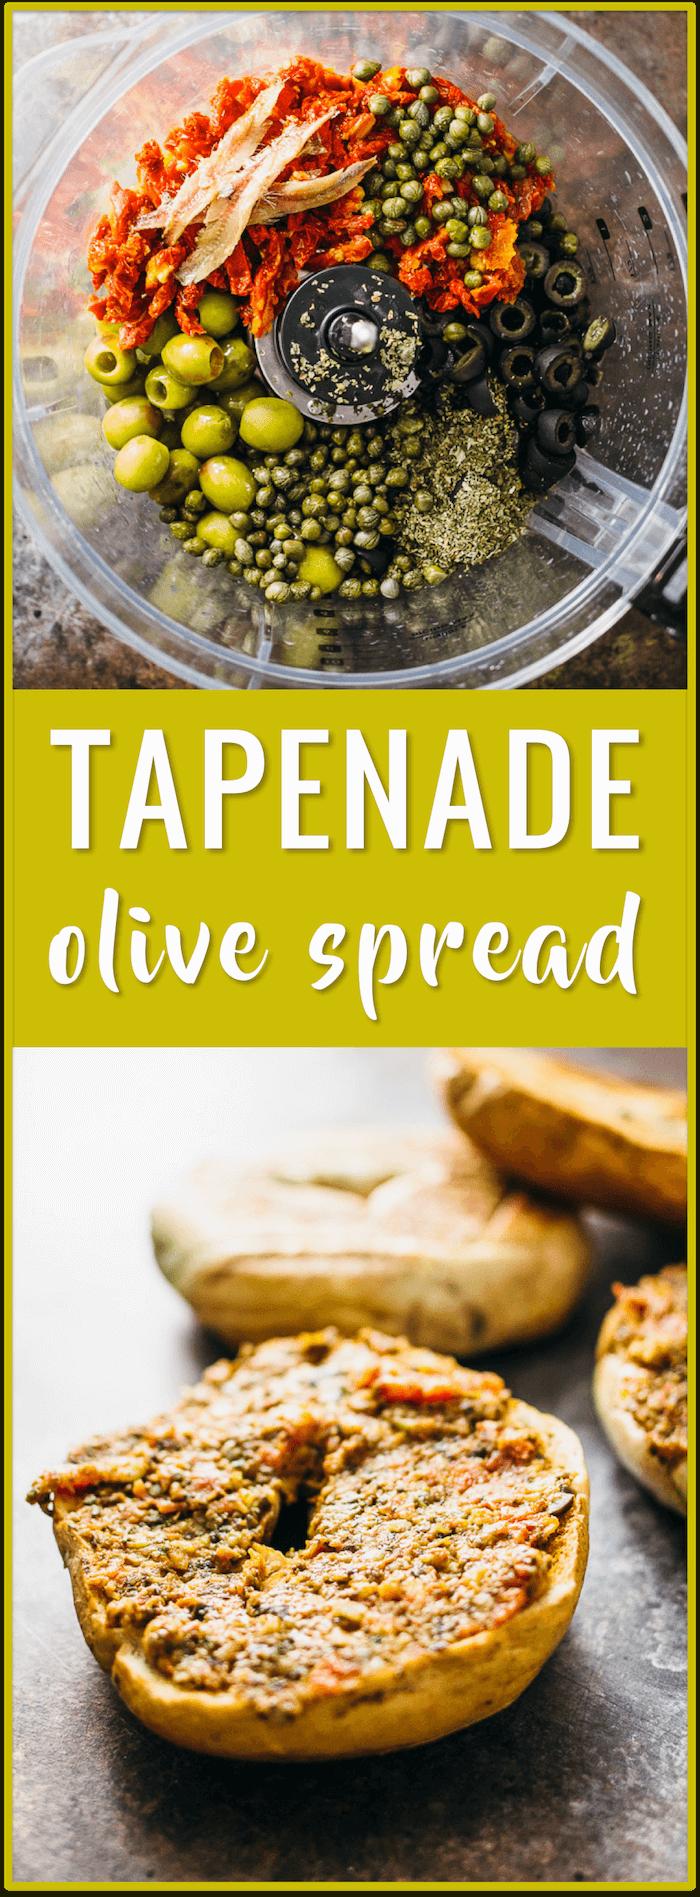 olive spread, olive tapenade, sun dried tomato tapenade, best tapenade recipe, black olives, green olives, olive paste, olive spread, easy, appetizer, spread, bread, bagel